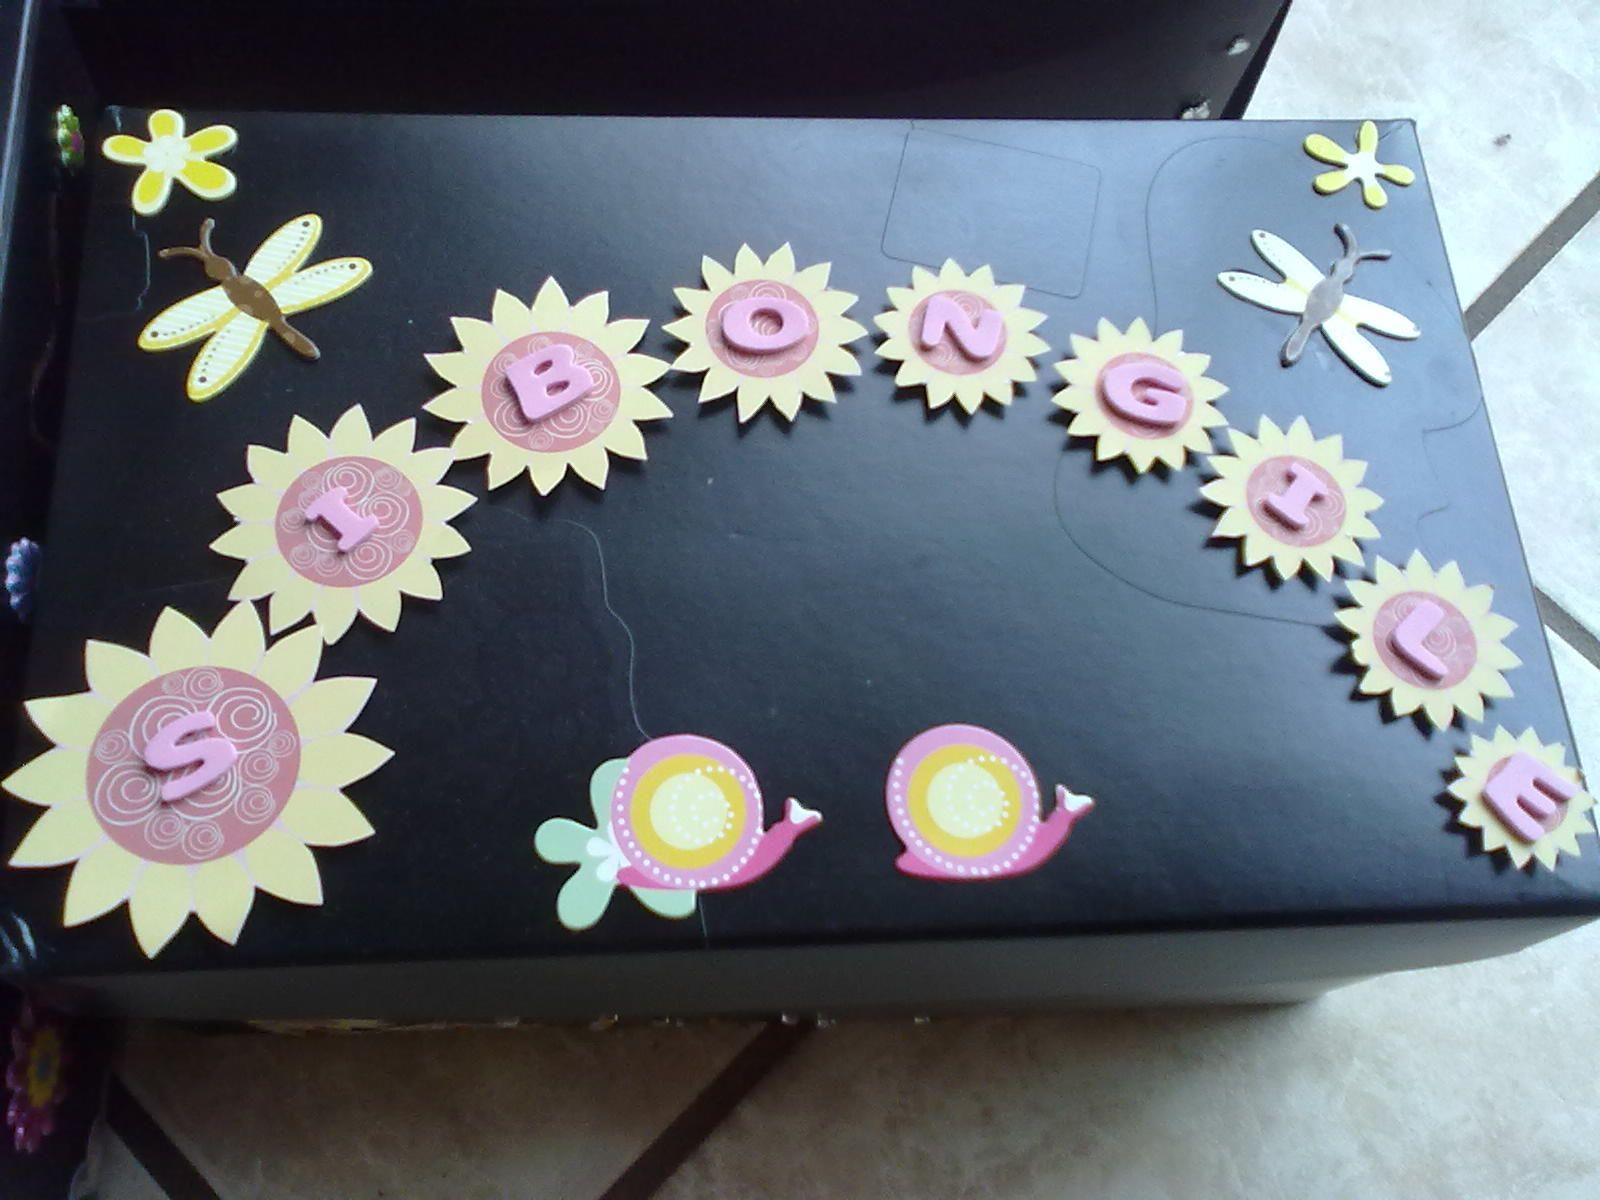 Decorate Shoe Box Ways To Decorate Shoe Boxes  Selfdecorated Shoe Boxme Likes